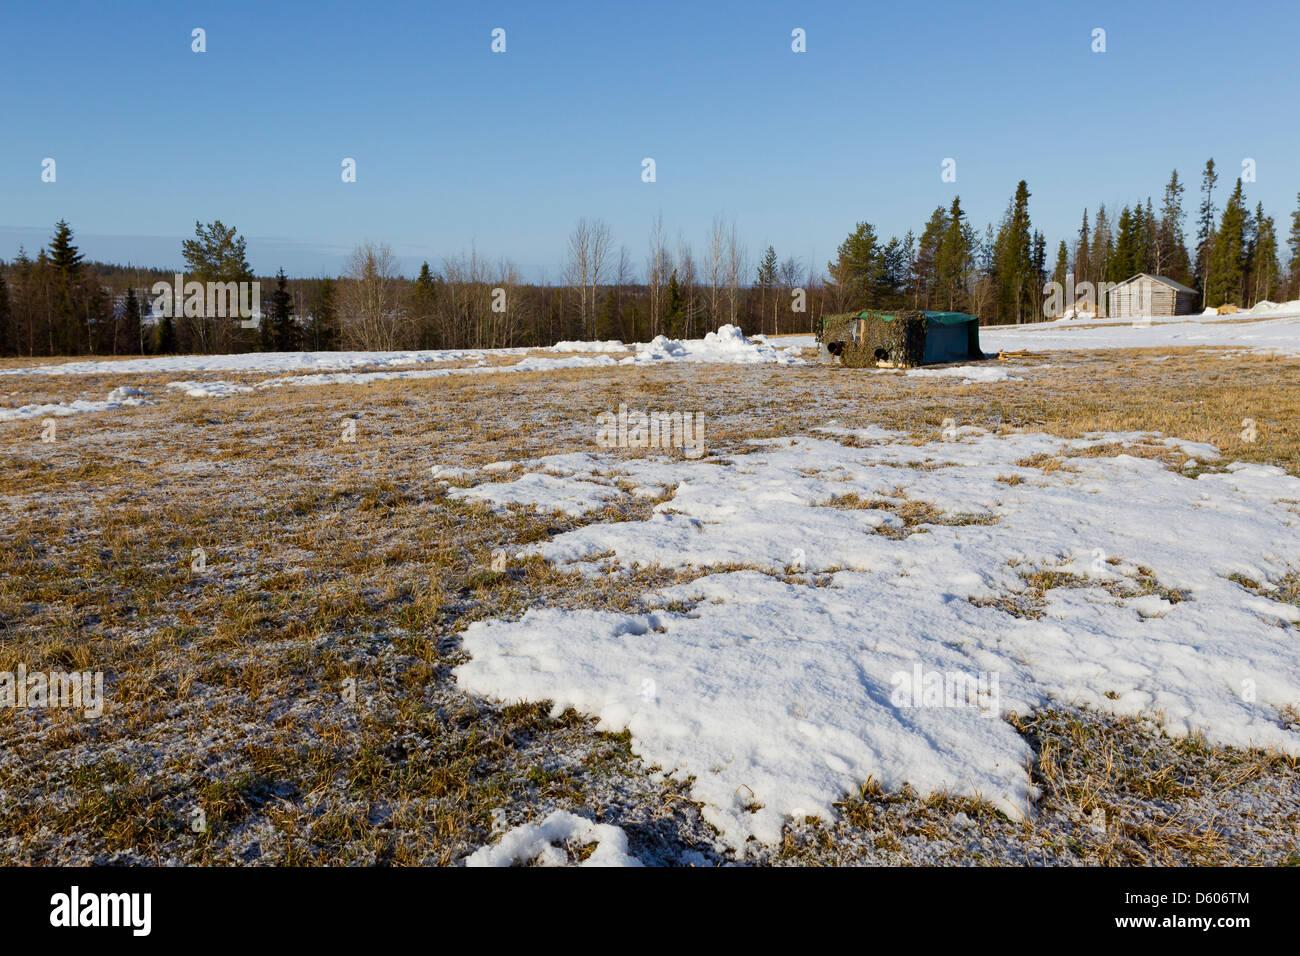 Mobile hide at Black Grouse Lyrurus tetrix lek near Kuusamo, Finland in Apirl. - Stock Image